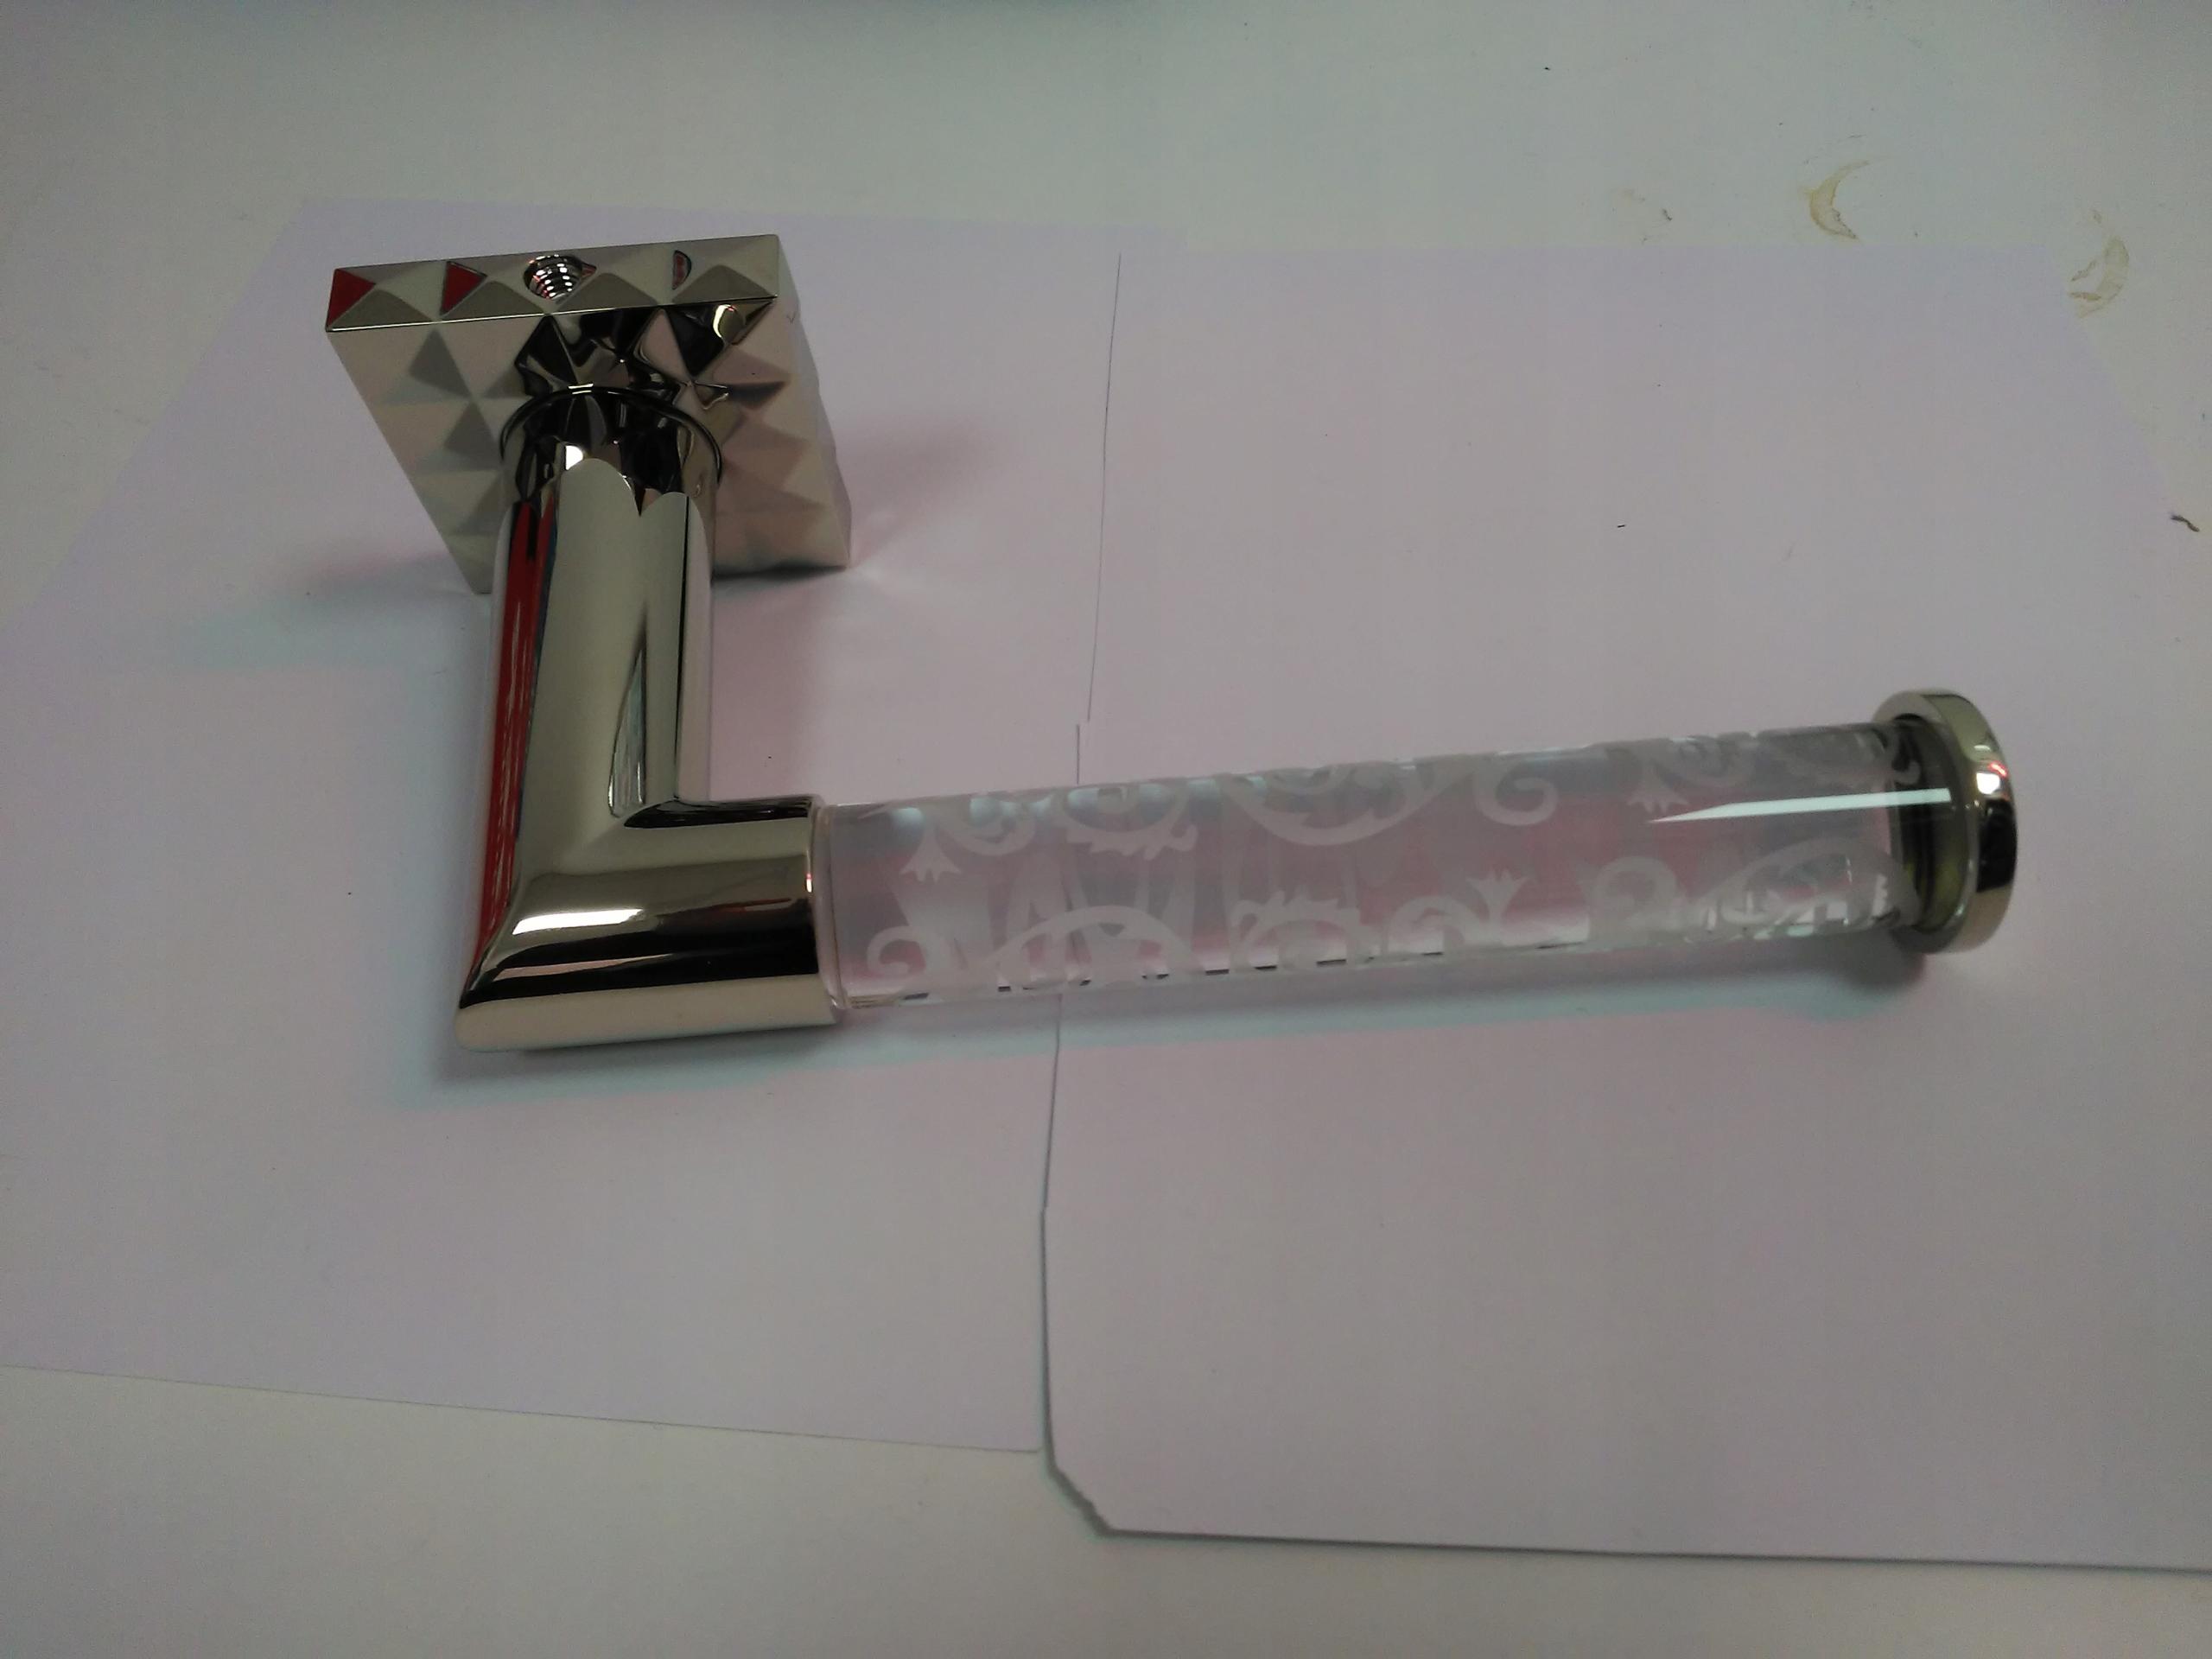 POMD'OR uchwyt na papier srebrny 704010353TD H1313